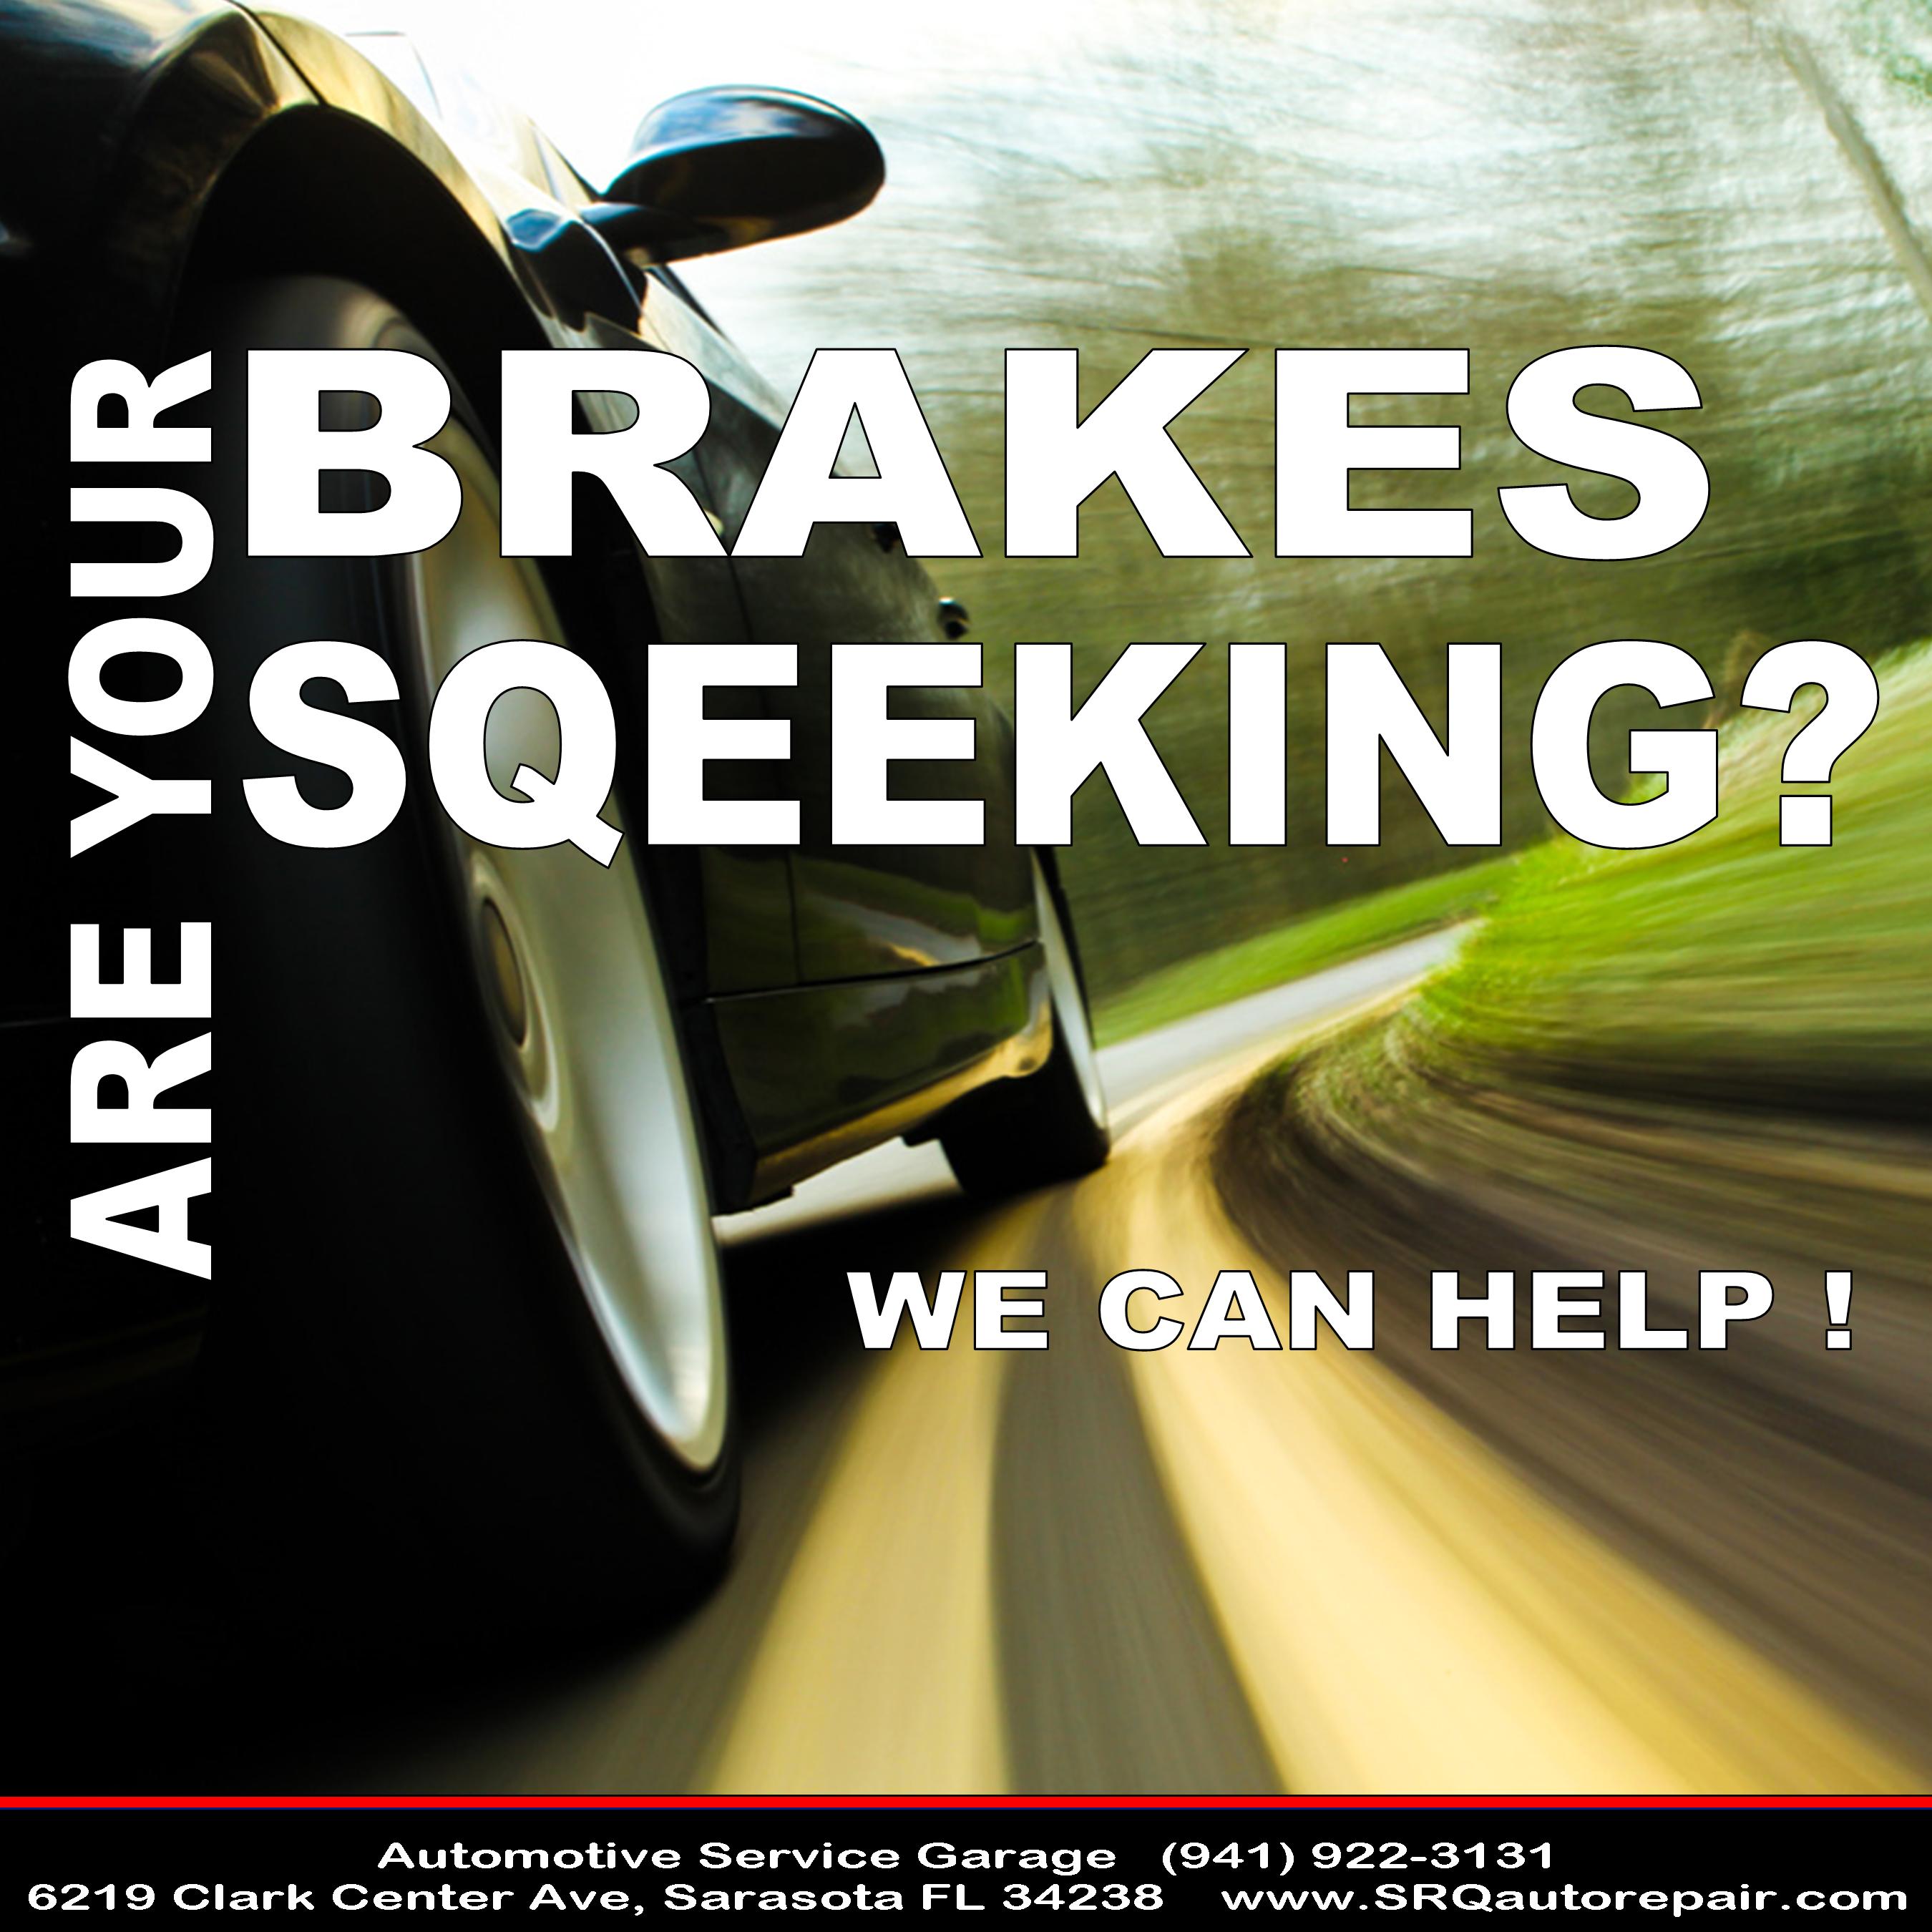 Automotive Service Garage 6219 Clark Center Avenue Sarasota Fl 34238 941 922 3131 Full Service Auto Repair